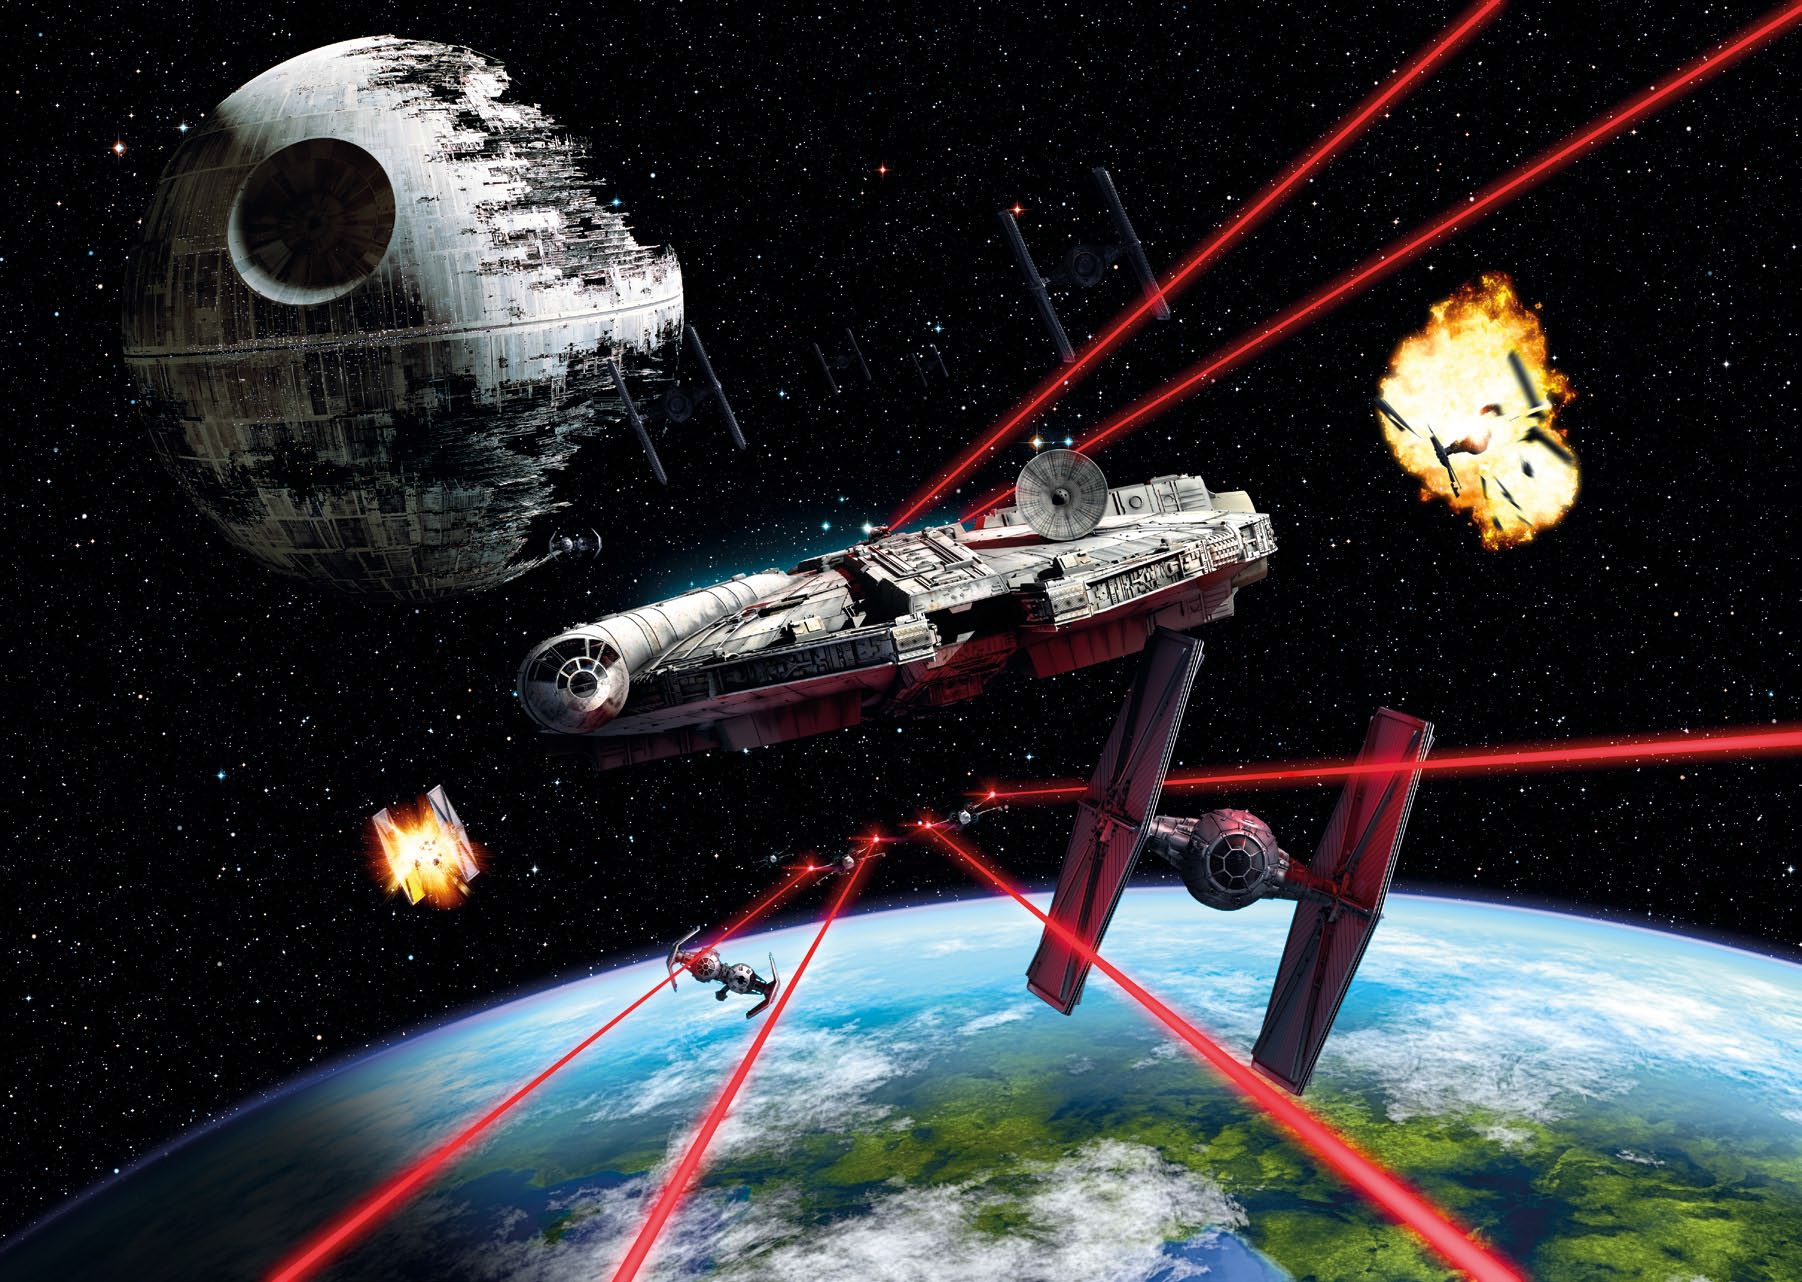 Poster XXL Star Wars Millennium Falcon - Panoramique - KOMAR